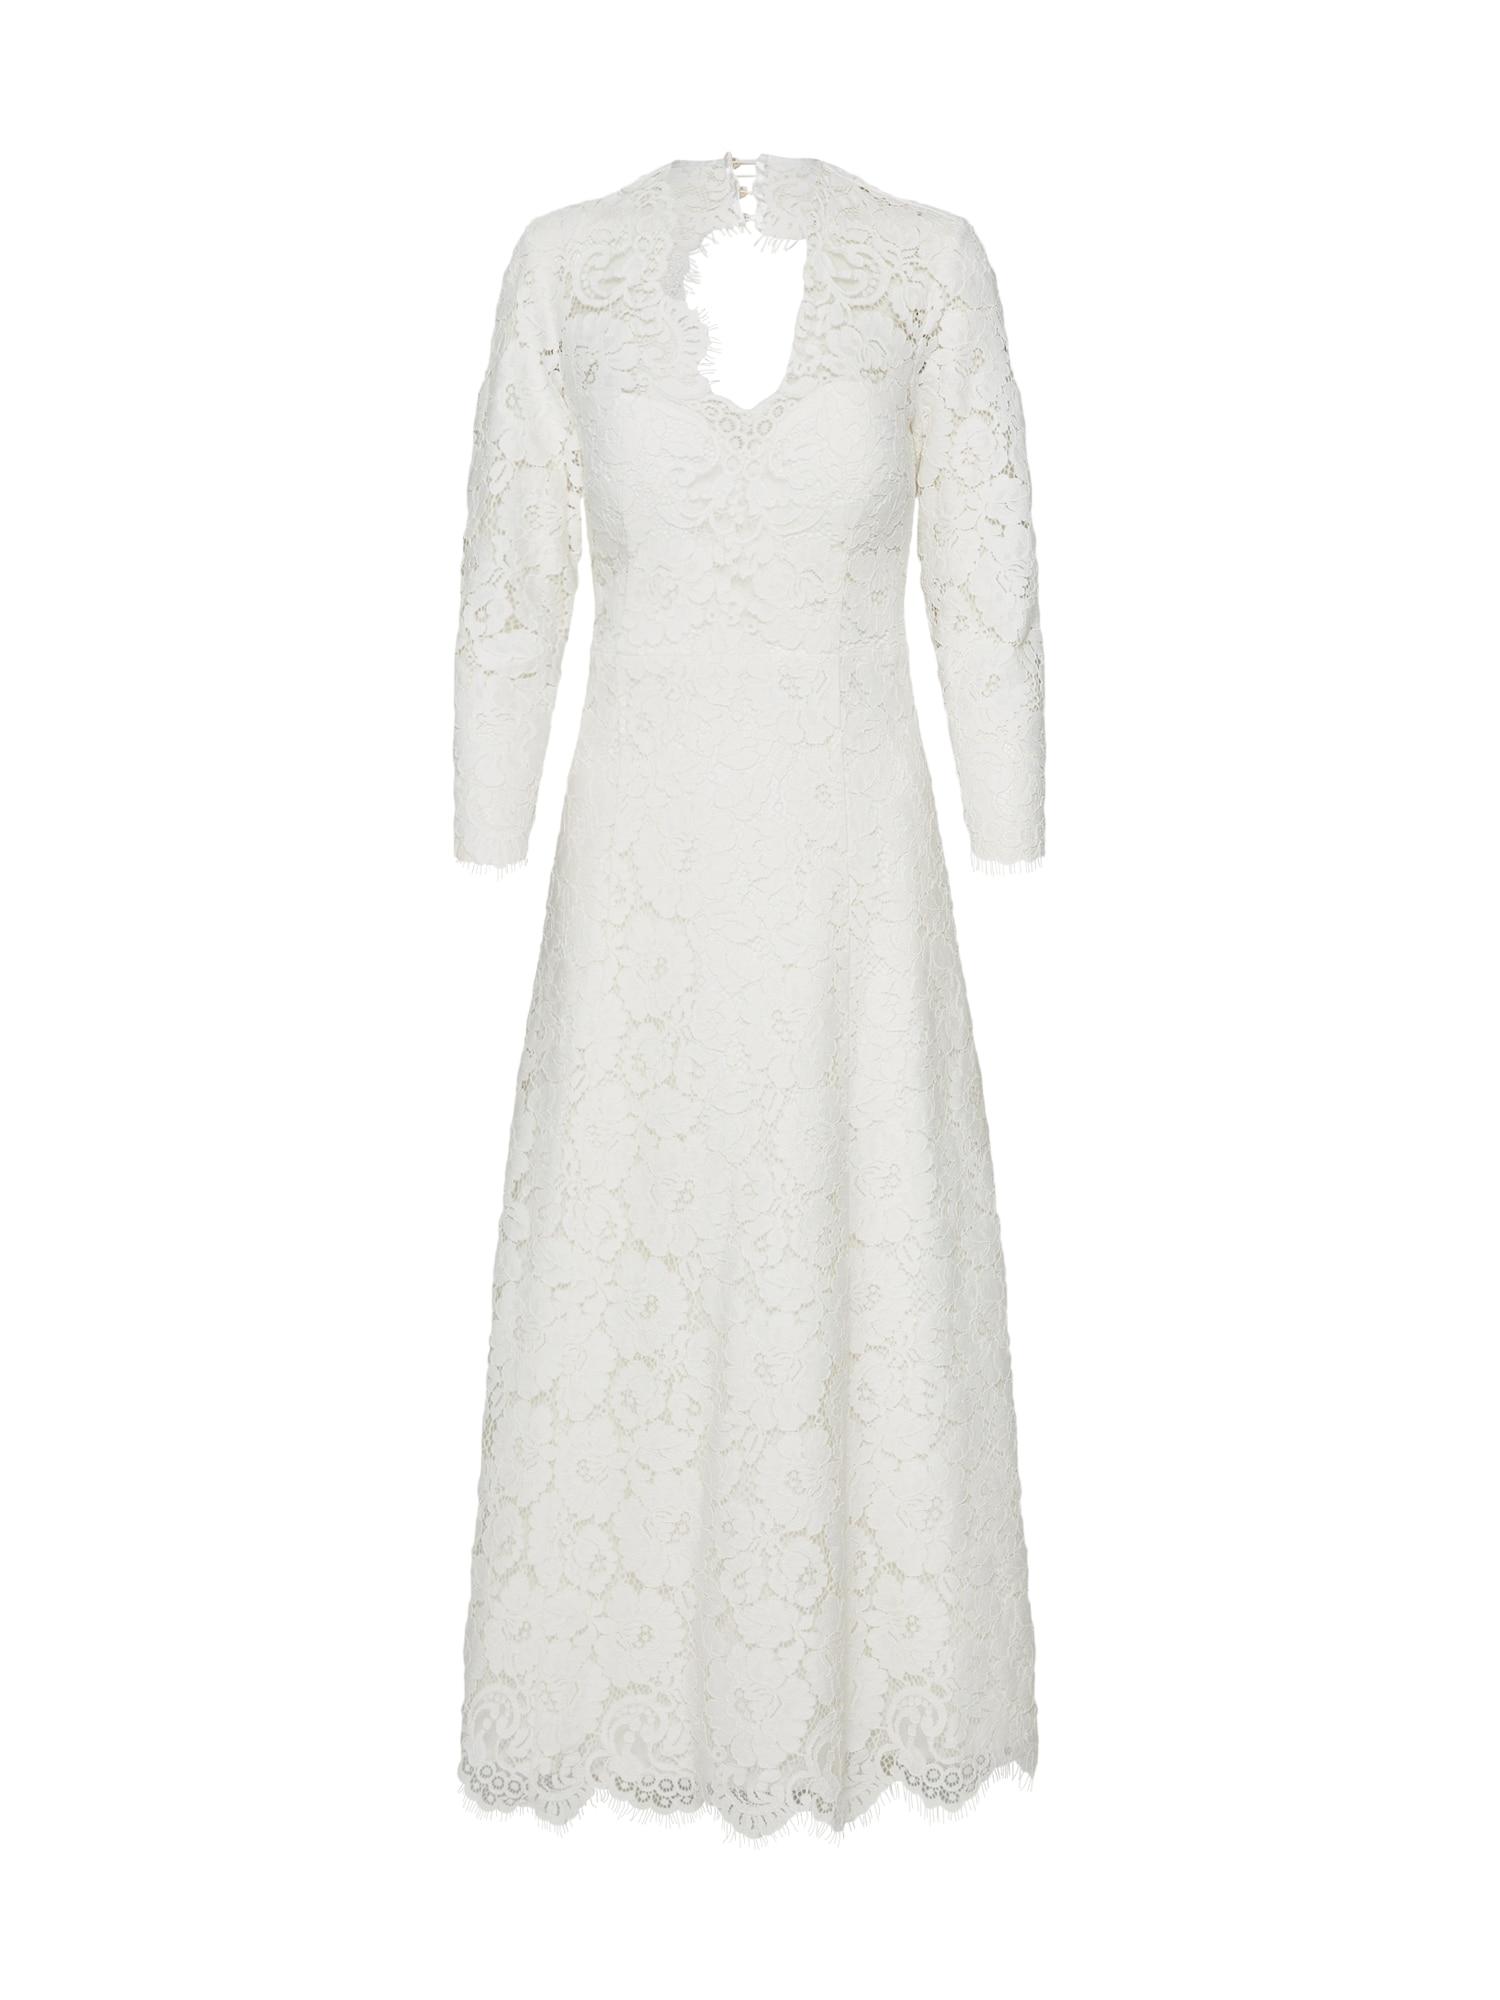 IVY & OAK Kokteilinė suknelė vilnos balta